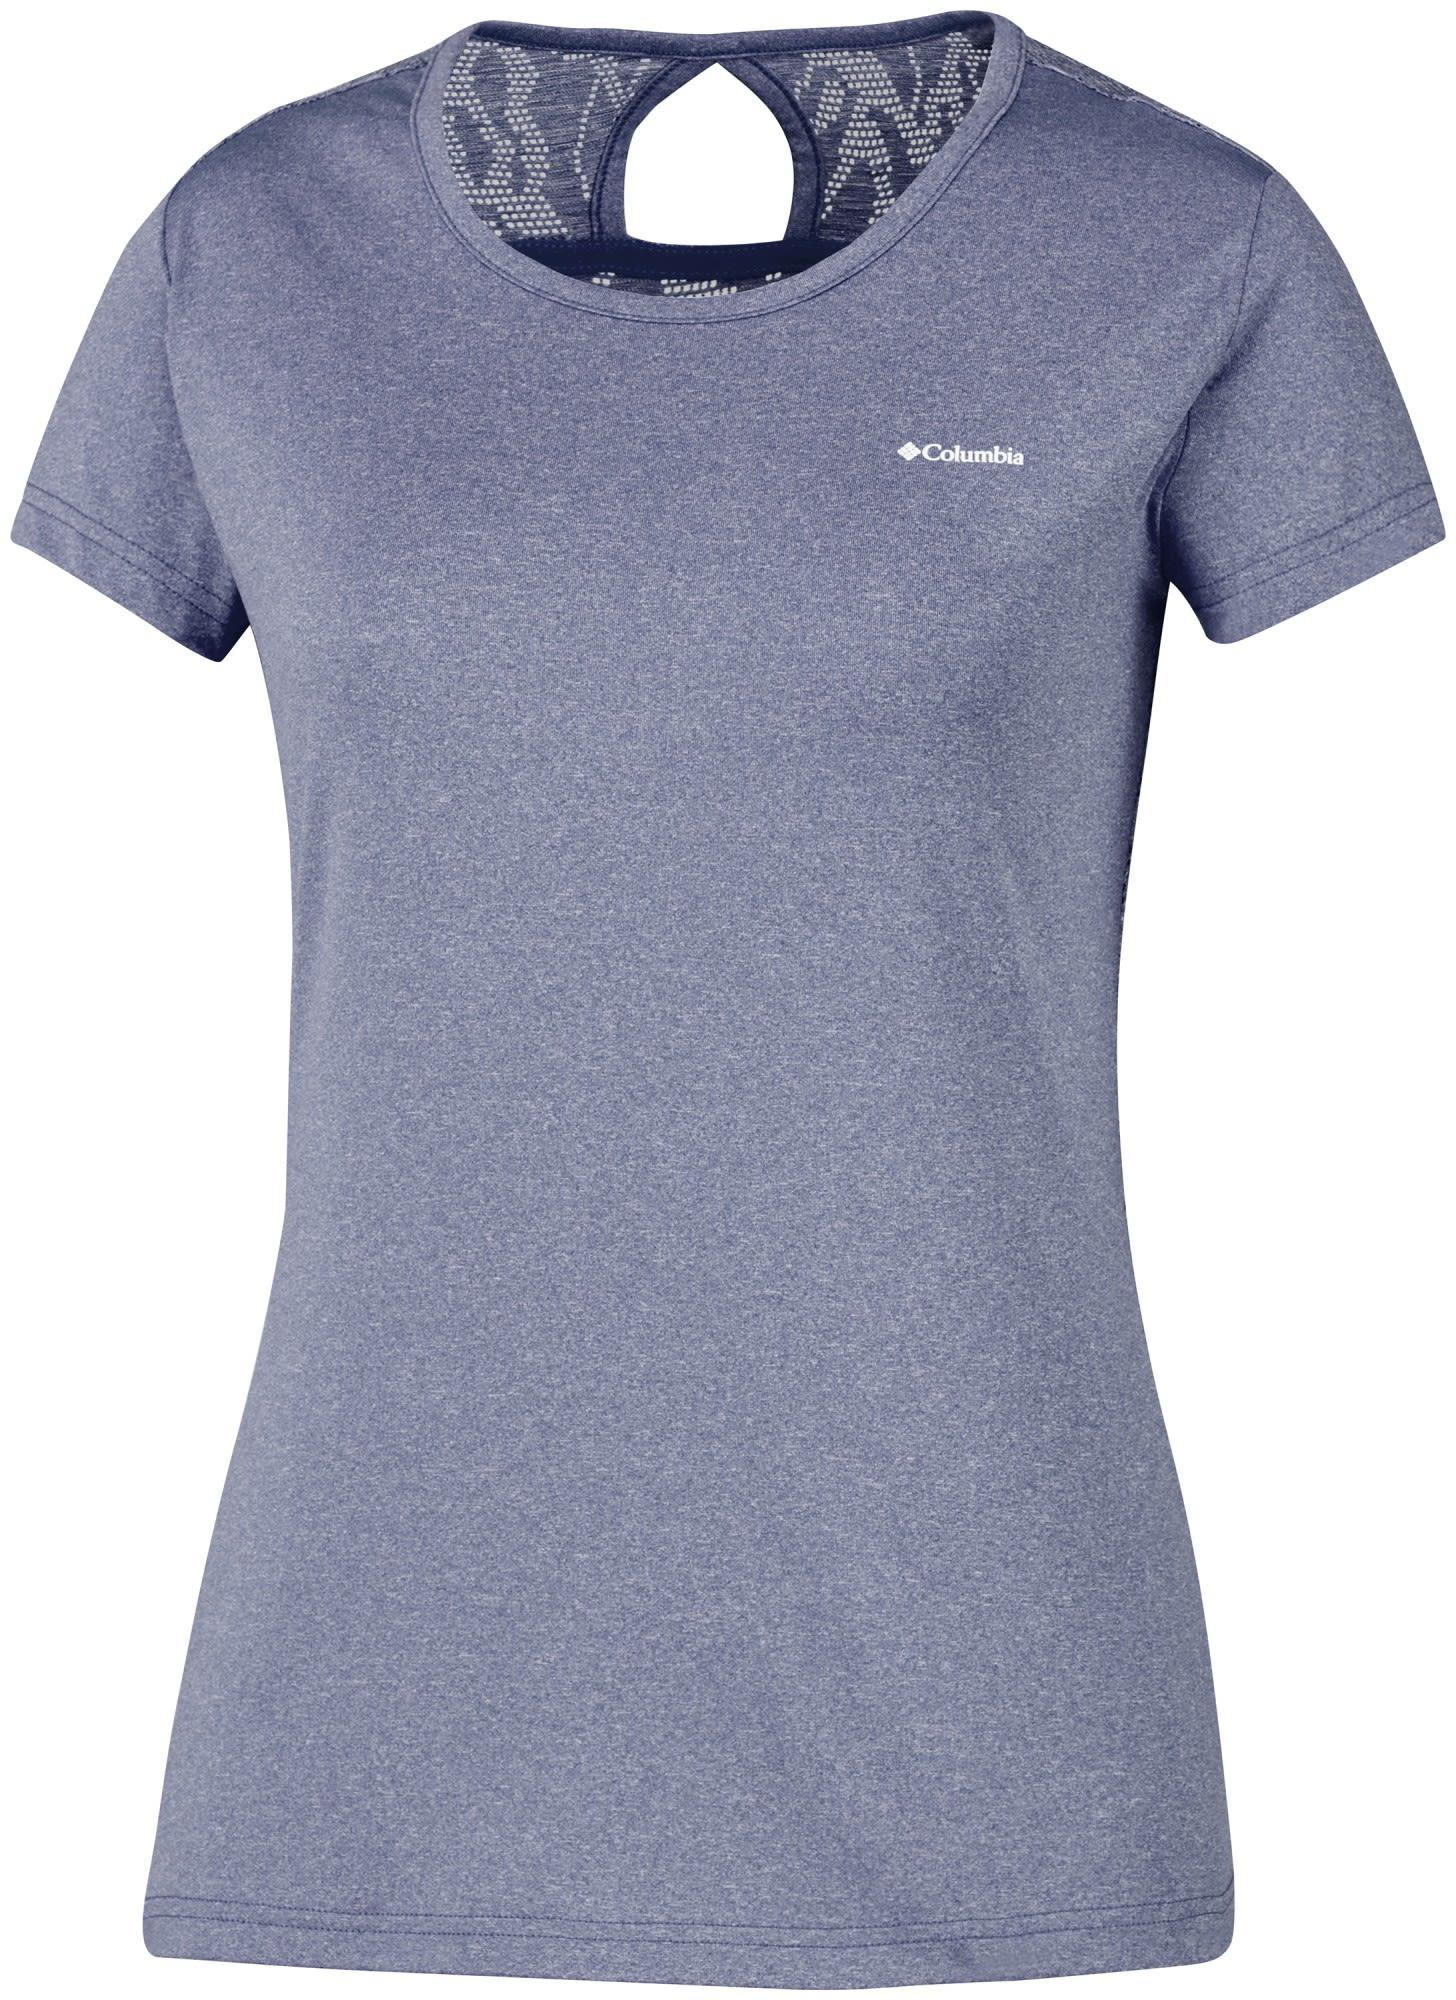 Columbia Peak TO Point Novelty Short Sleeve Shirt Blau, Female Kurzarm-Shirt, M